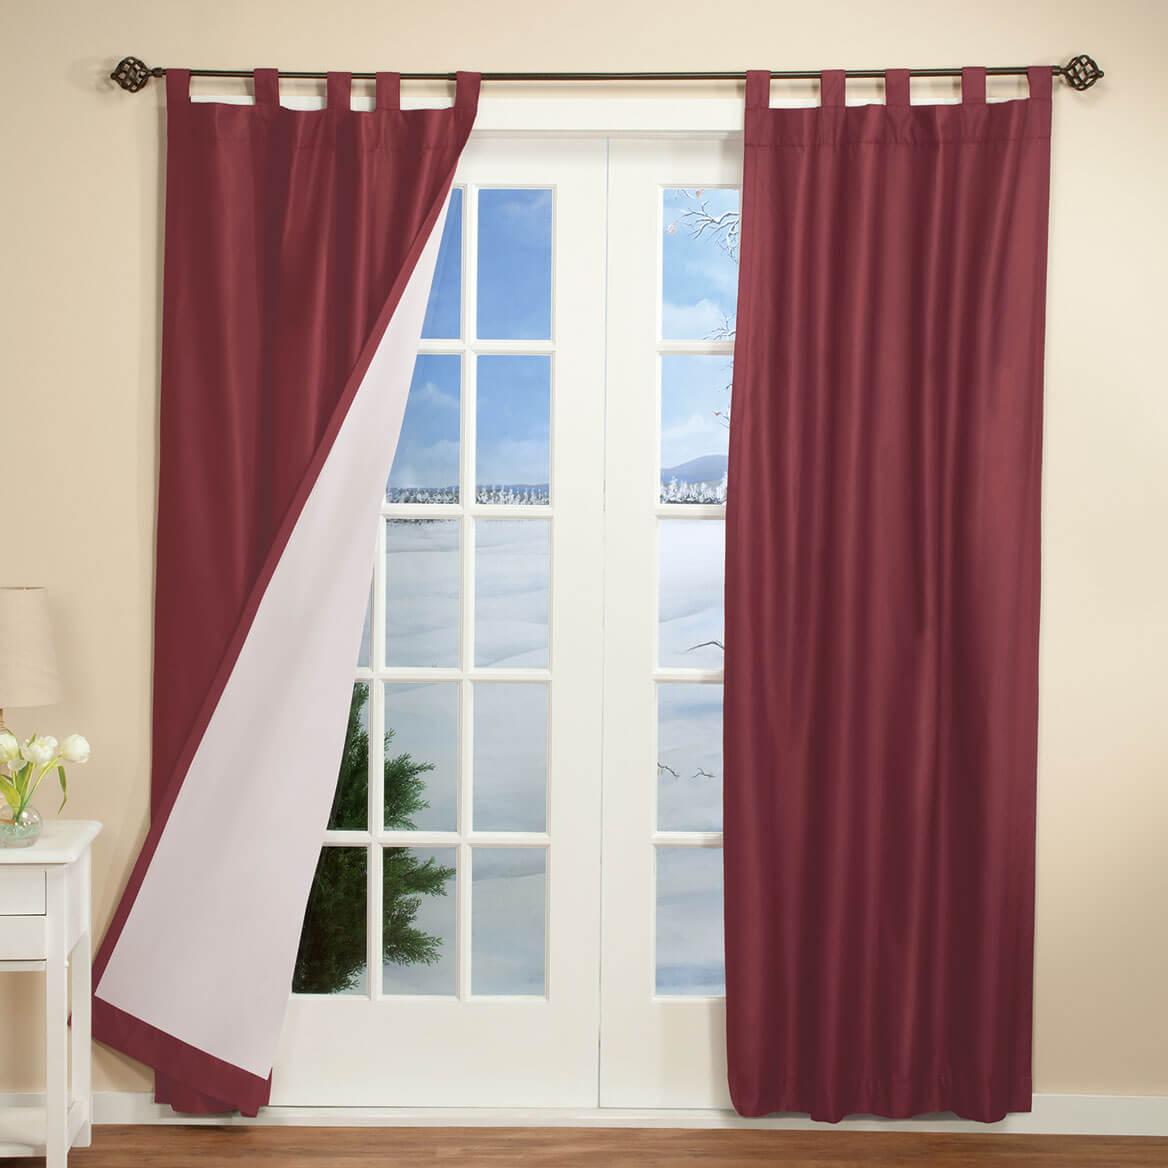 Energy Saving Tab Top Curtains Set Of 2-347012